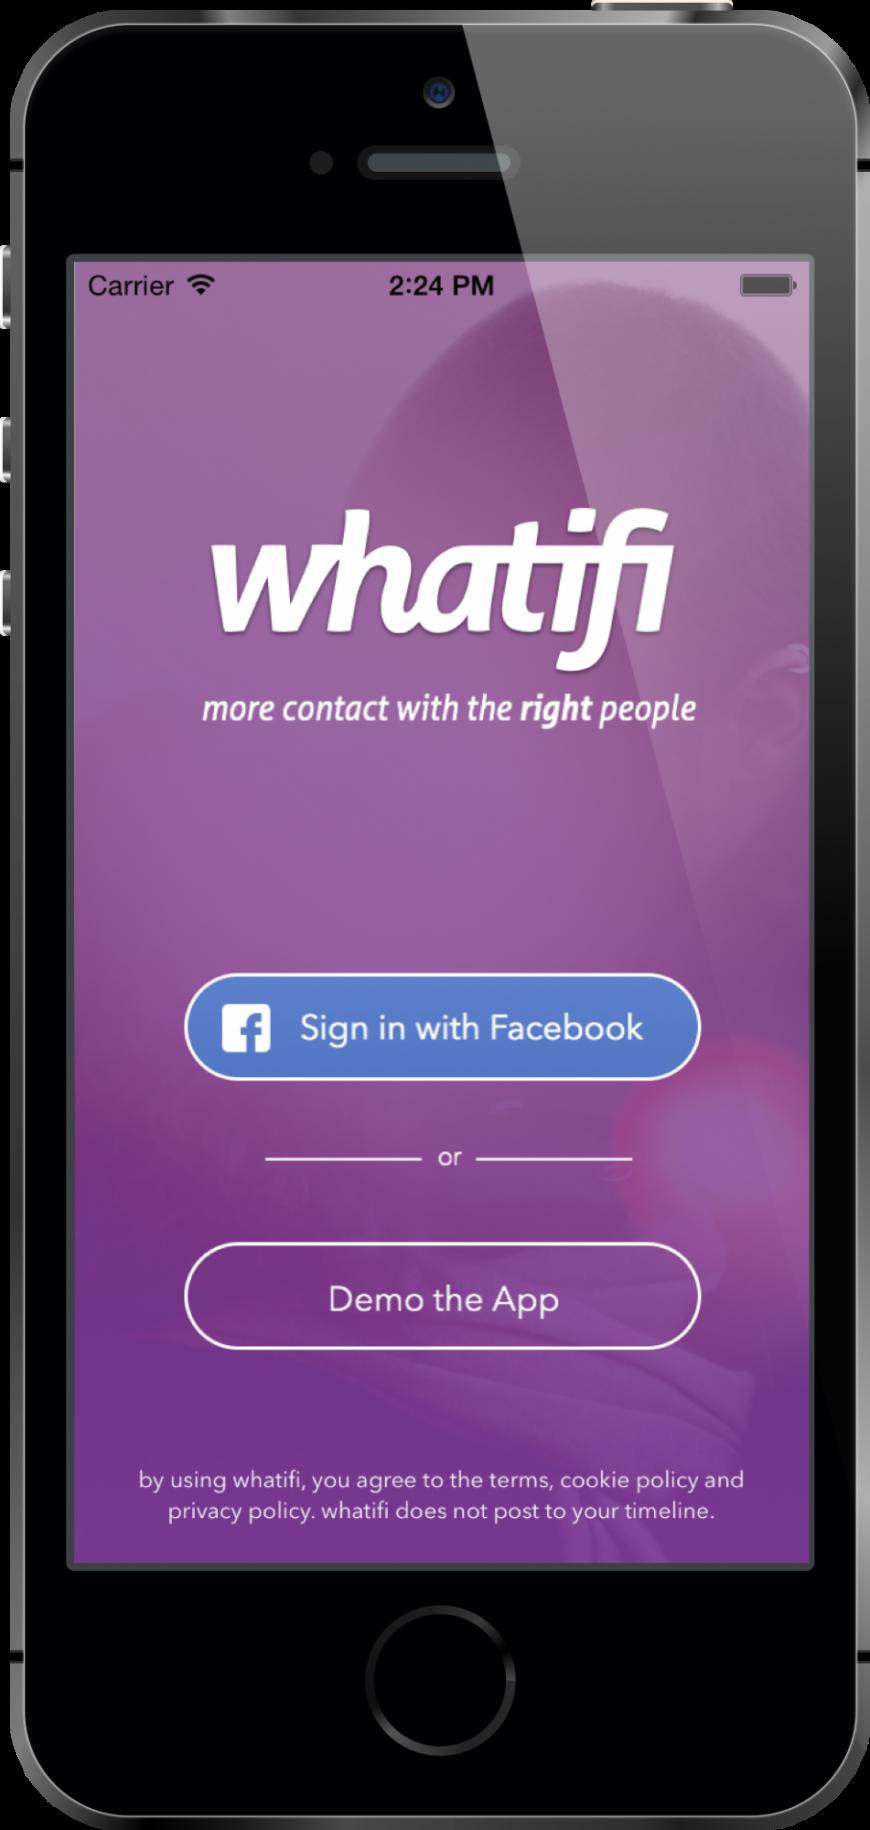 whatifi phone login